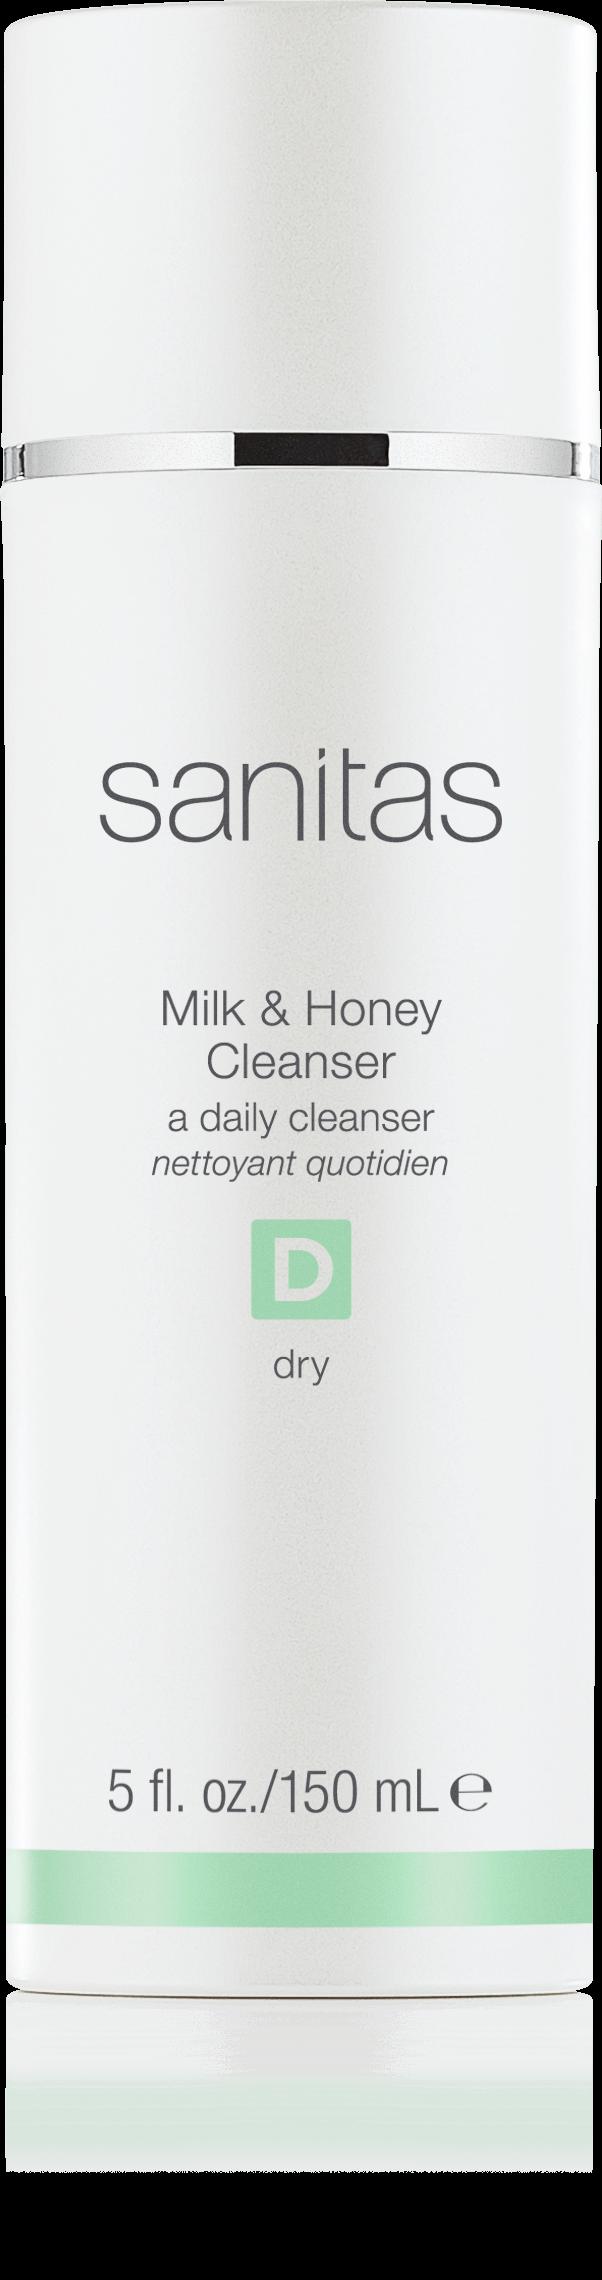 Sanitas Milk & Honey Cleanser 00001